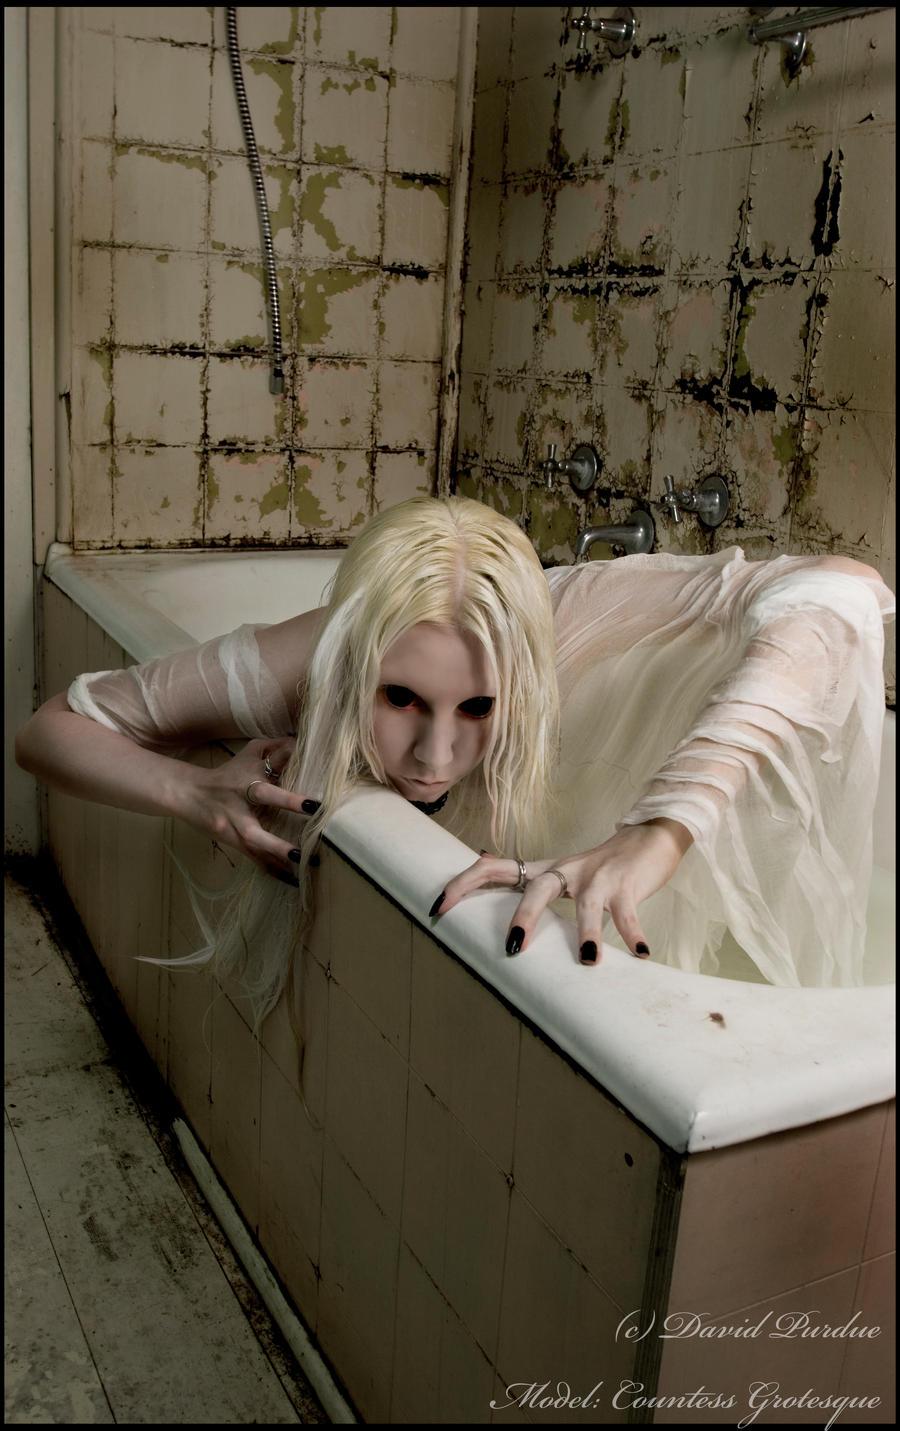 http://fc02.deviantart.net/fs70/i/2010/167/a/8/__creature___by_Countess_Grotesque.jpg